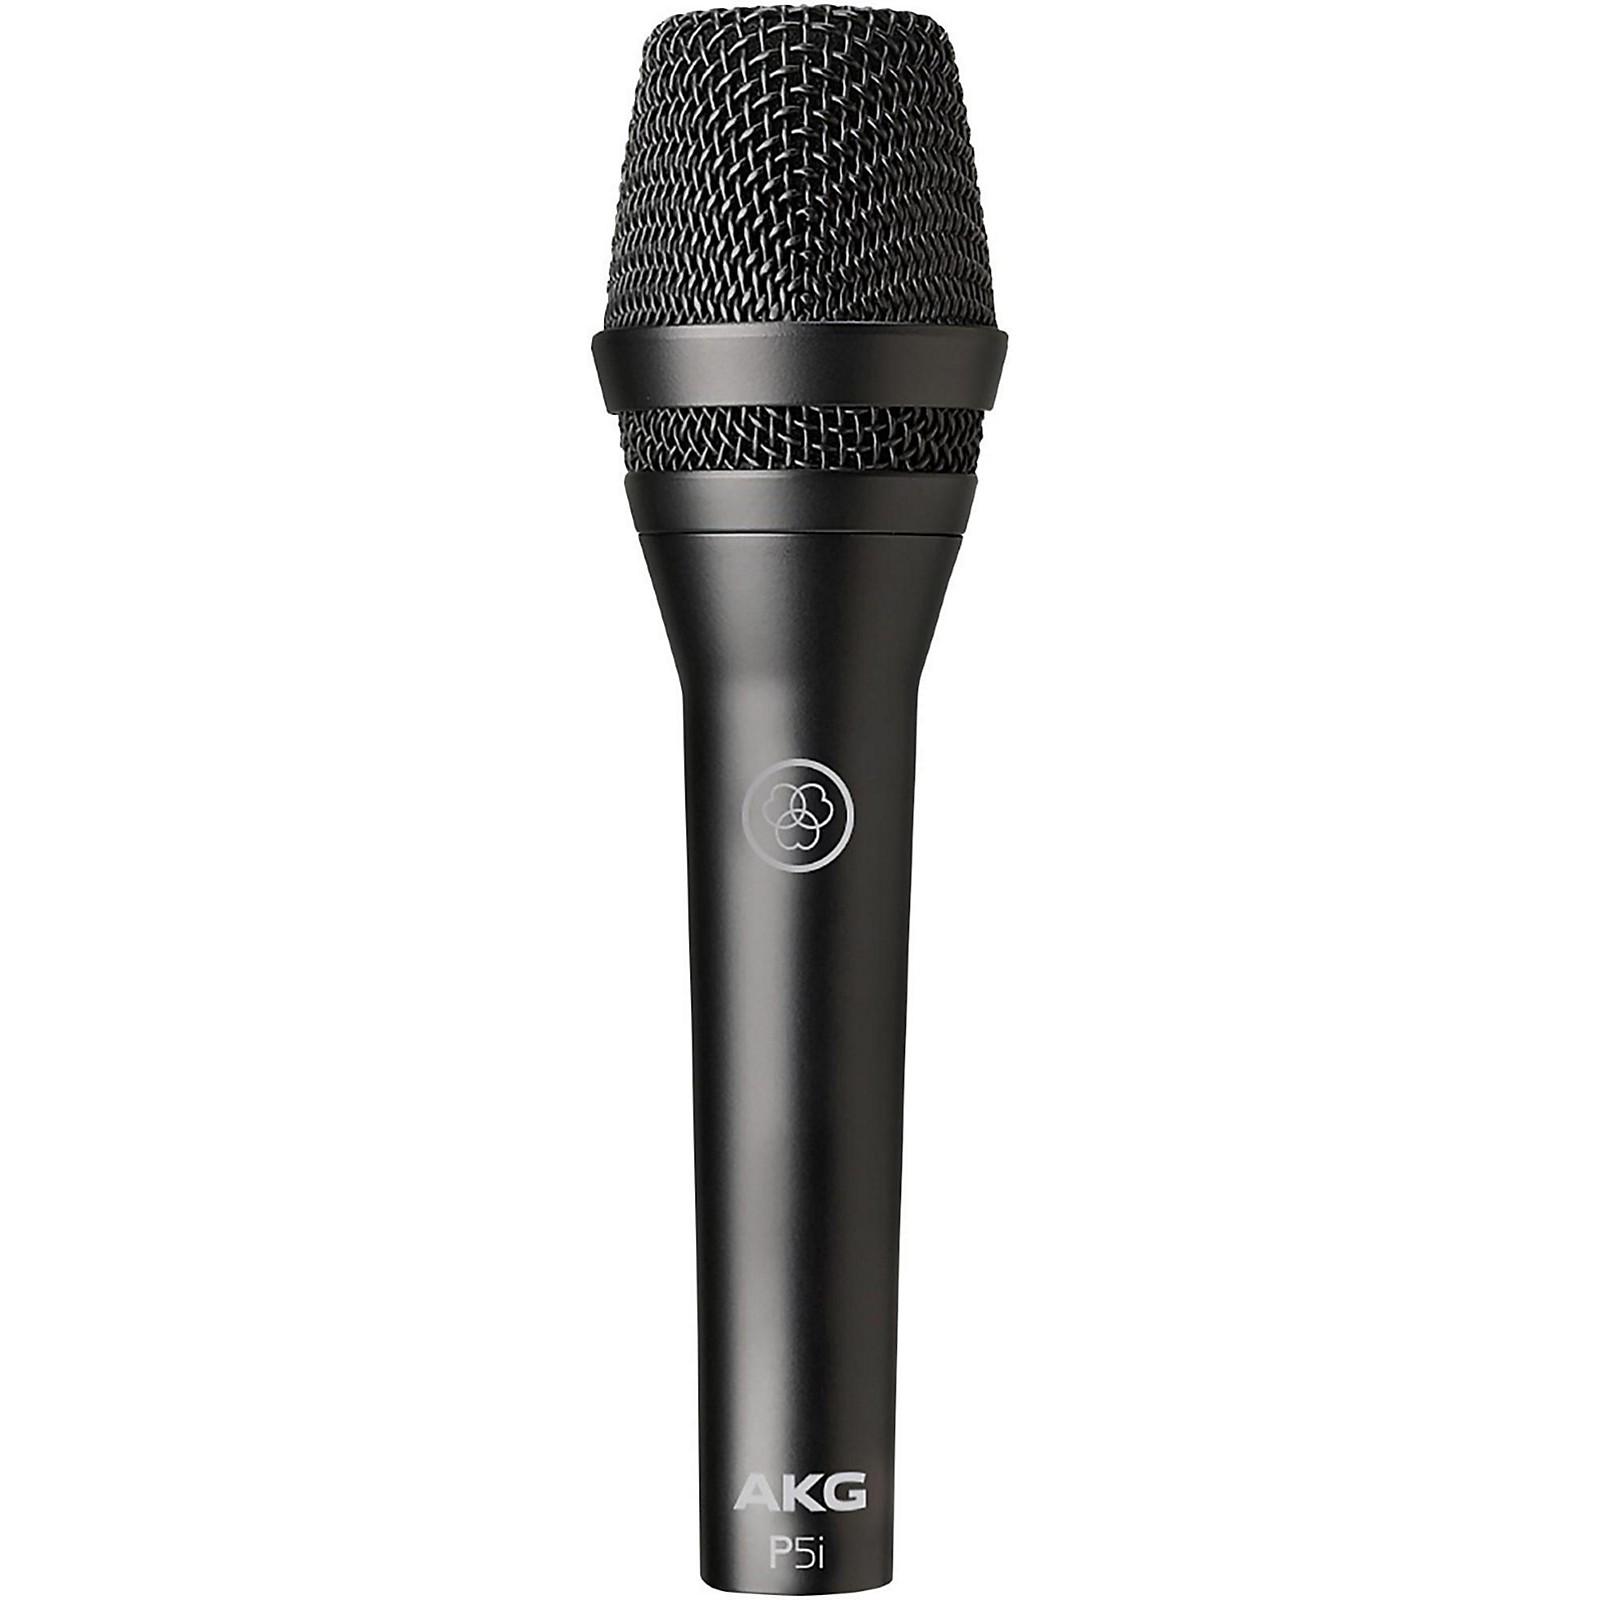 AKG P5i Handheld Vocal Microphone